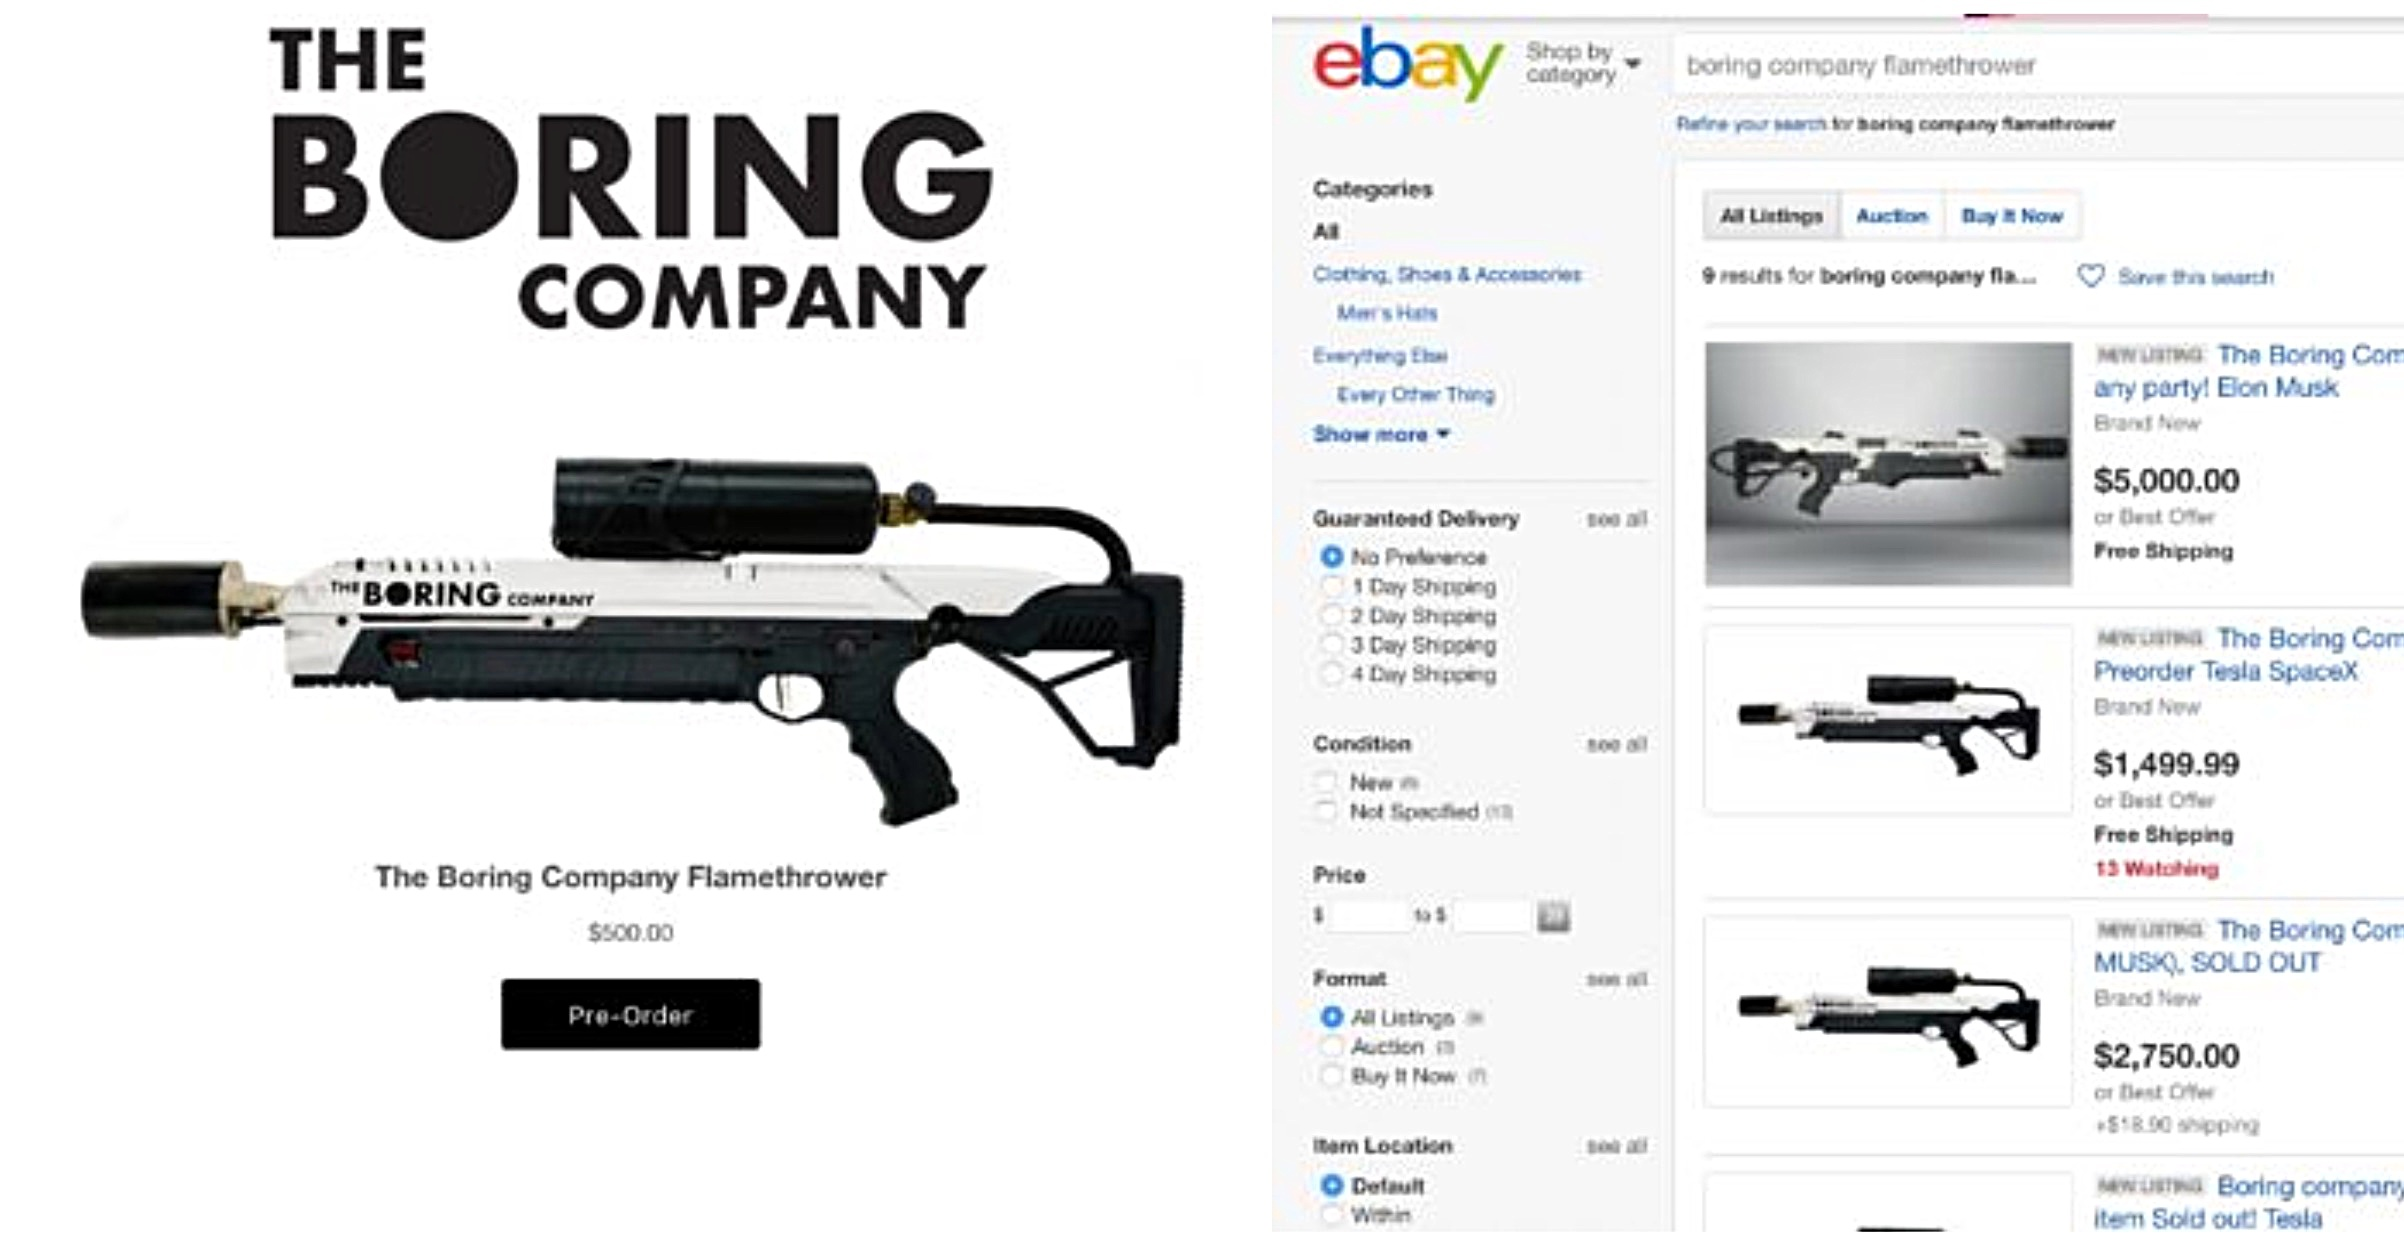 ebay-boring-company-flamethrower-listing